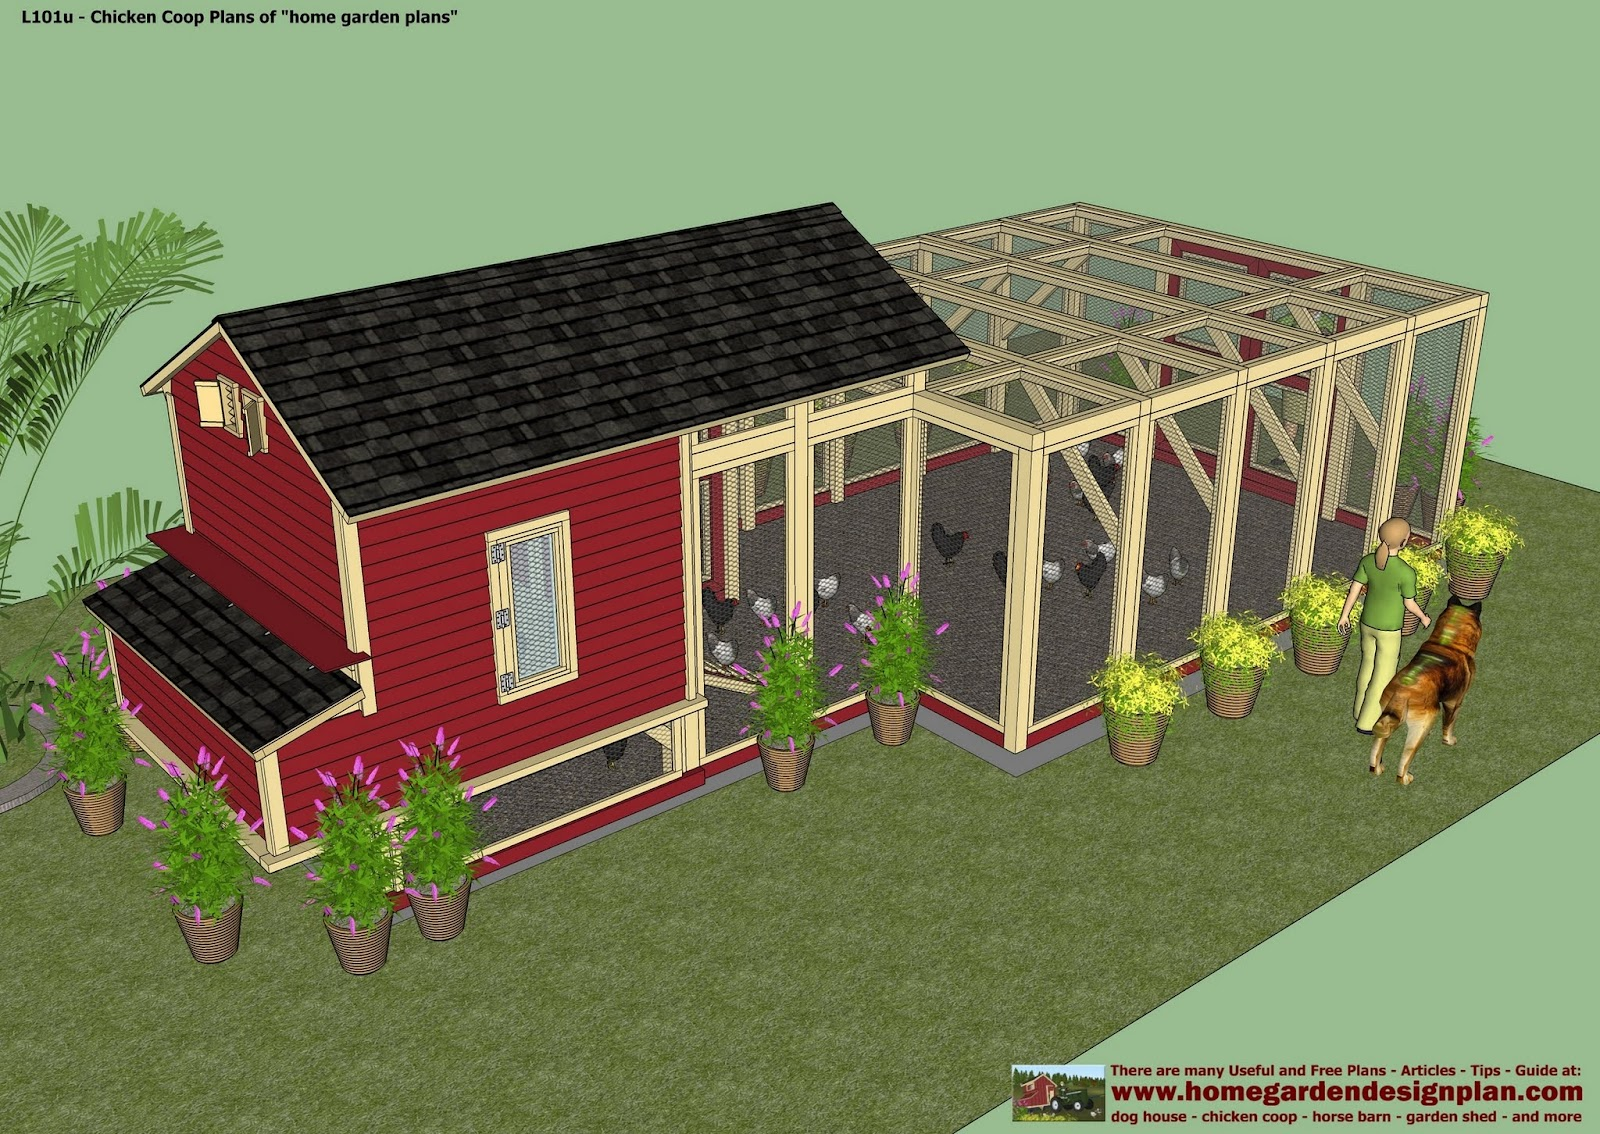 home garden plans: L101 - Chicken Coop Plans Construction ...